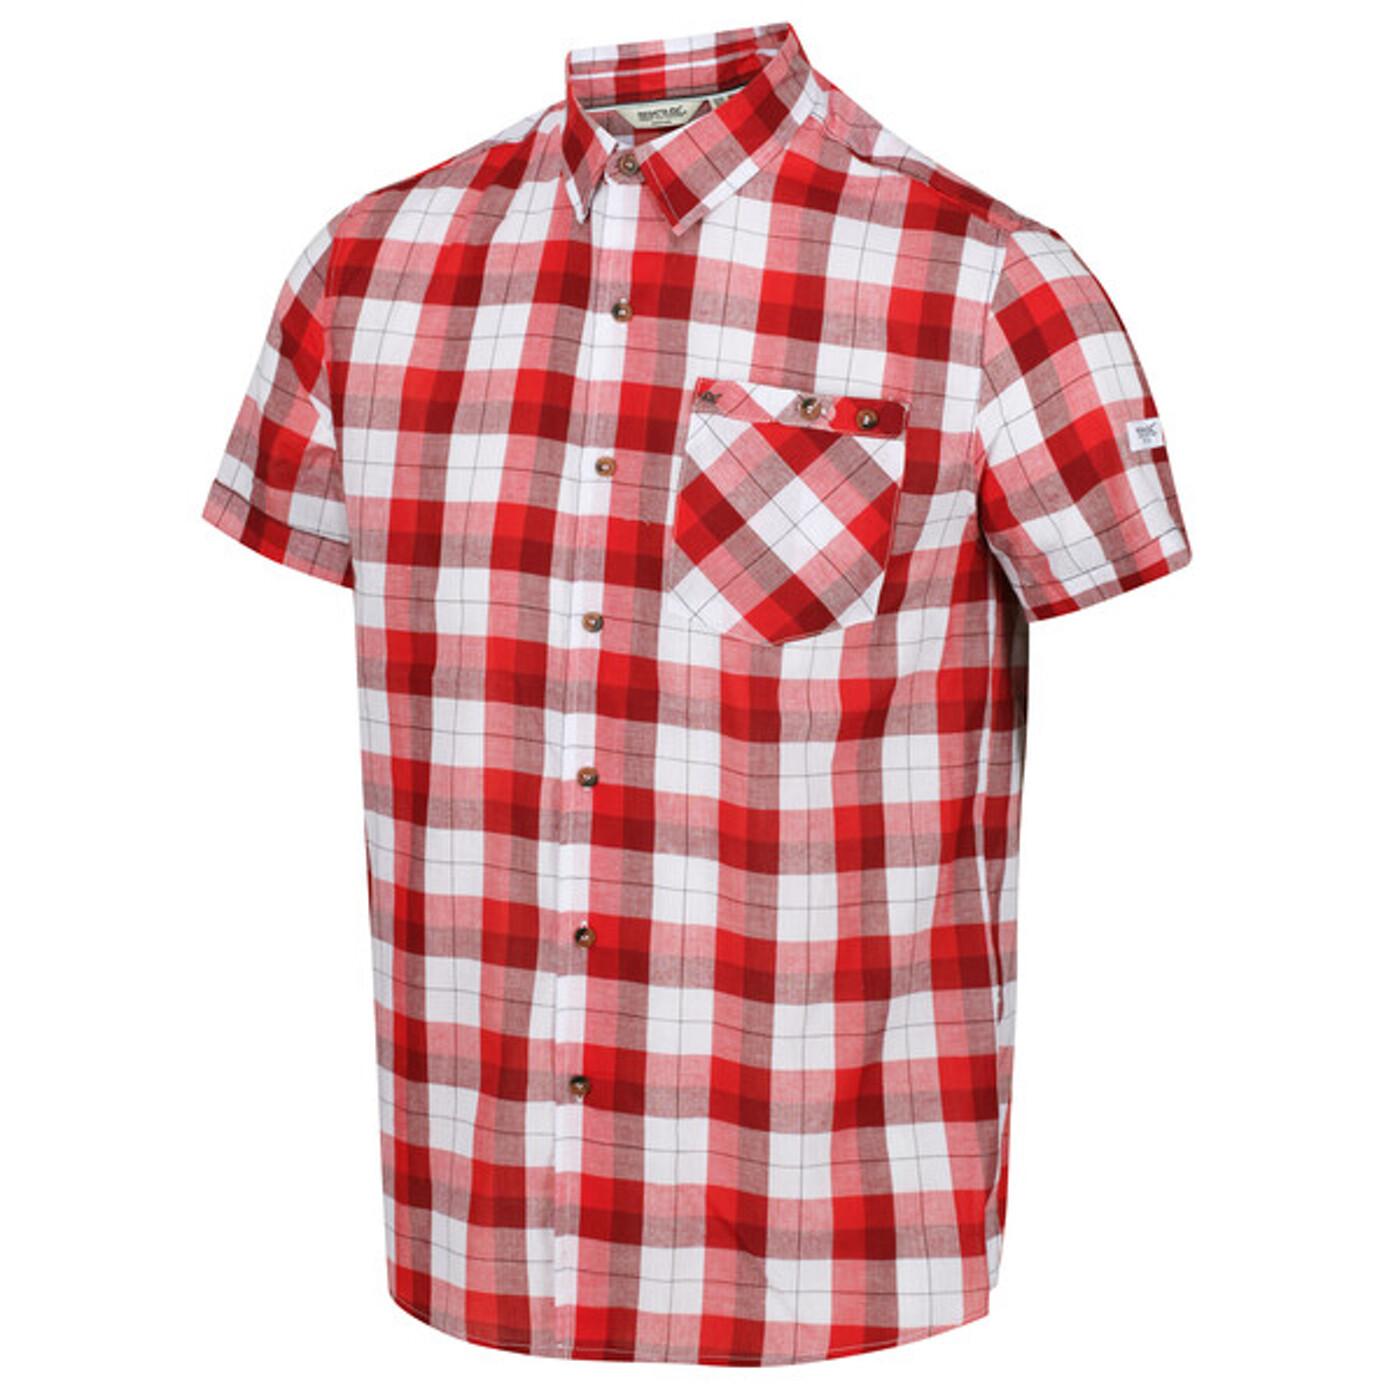 FUnktionshemd Ramiro Regatta - Herren